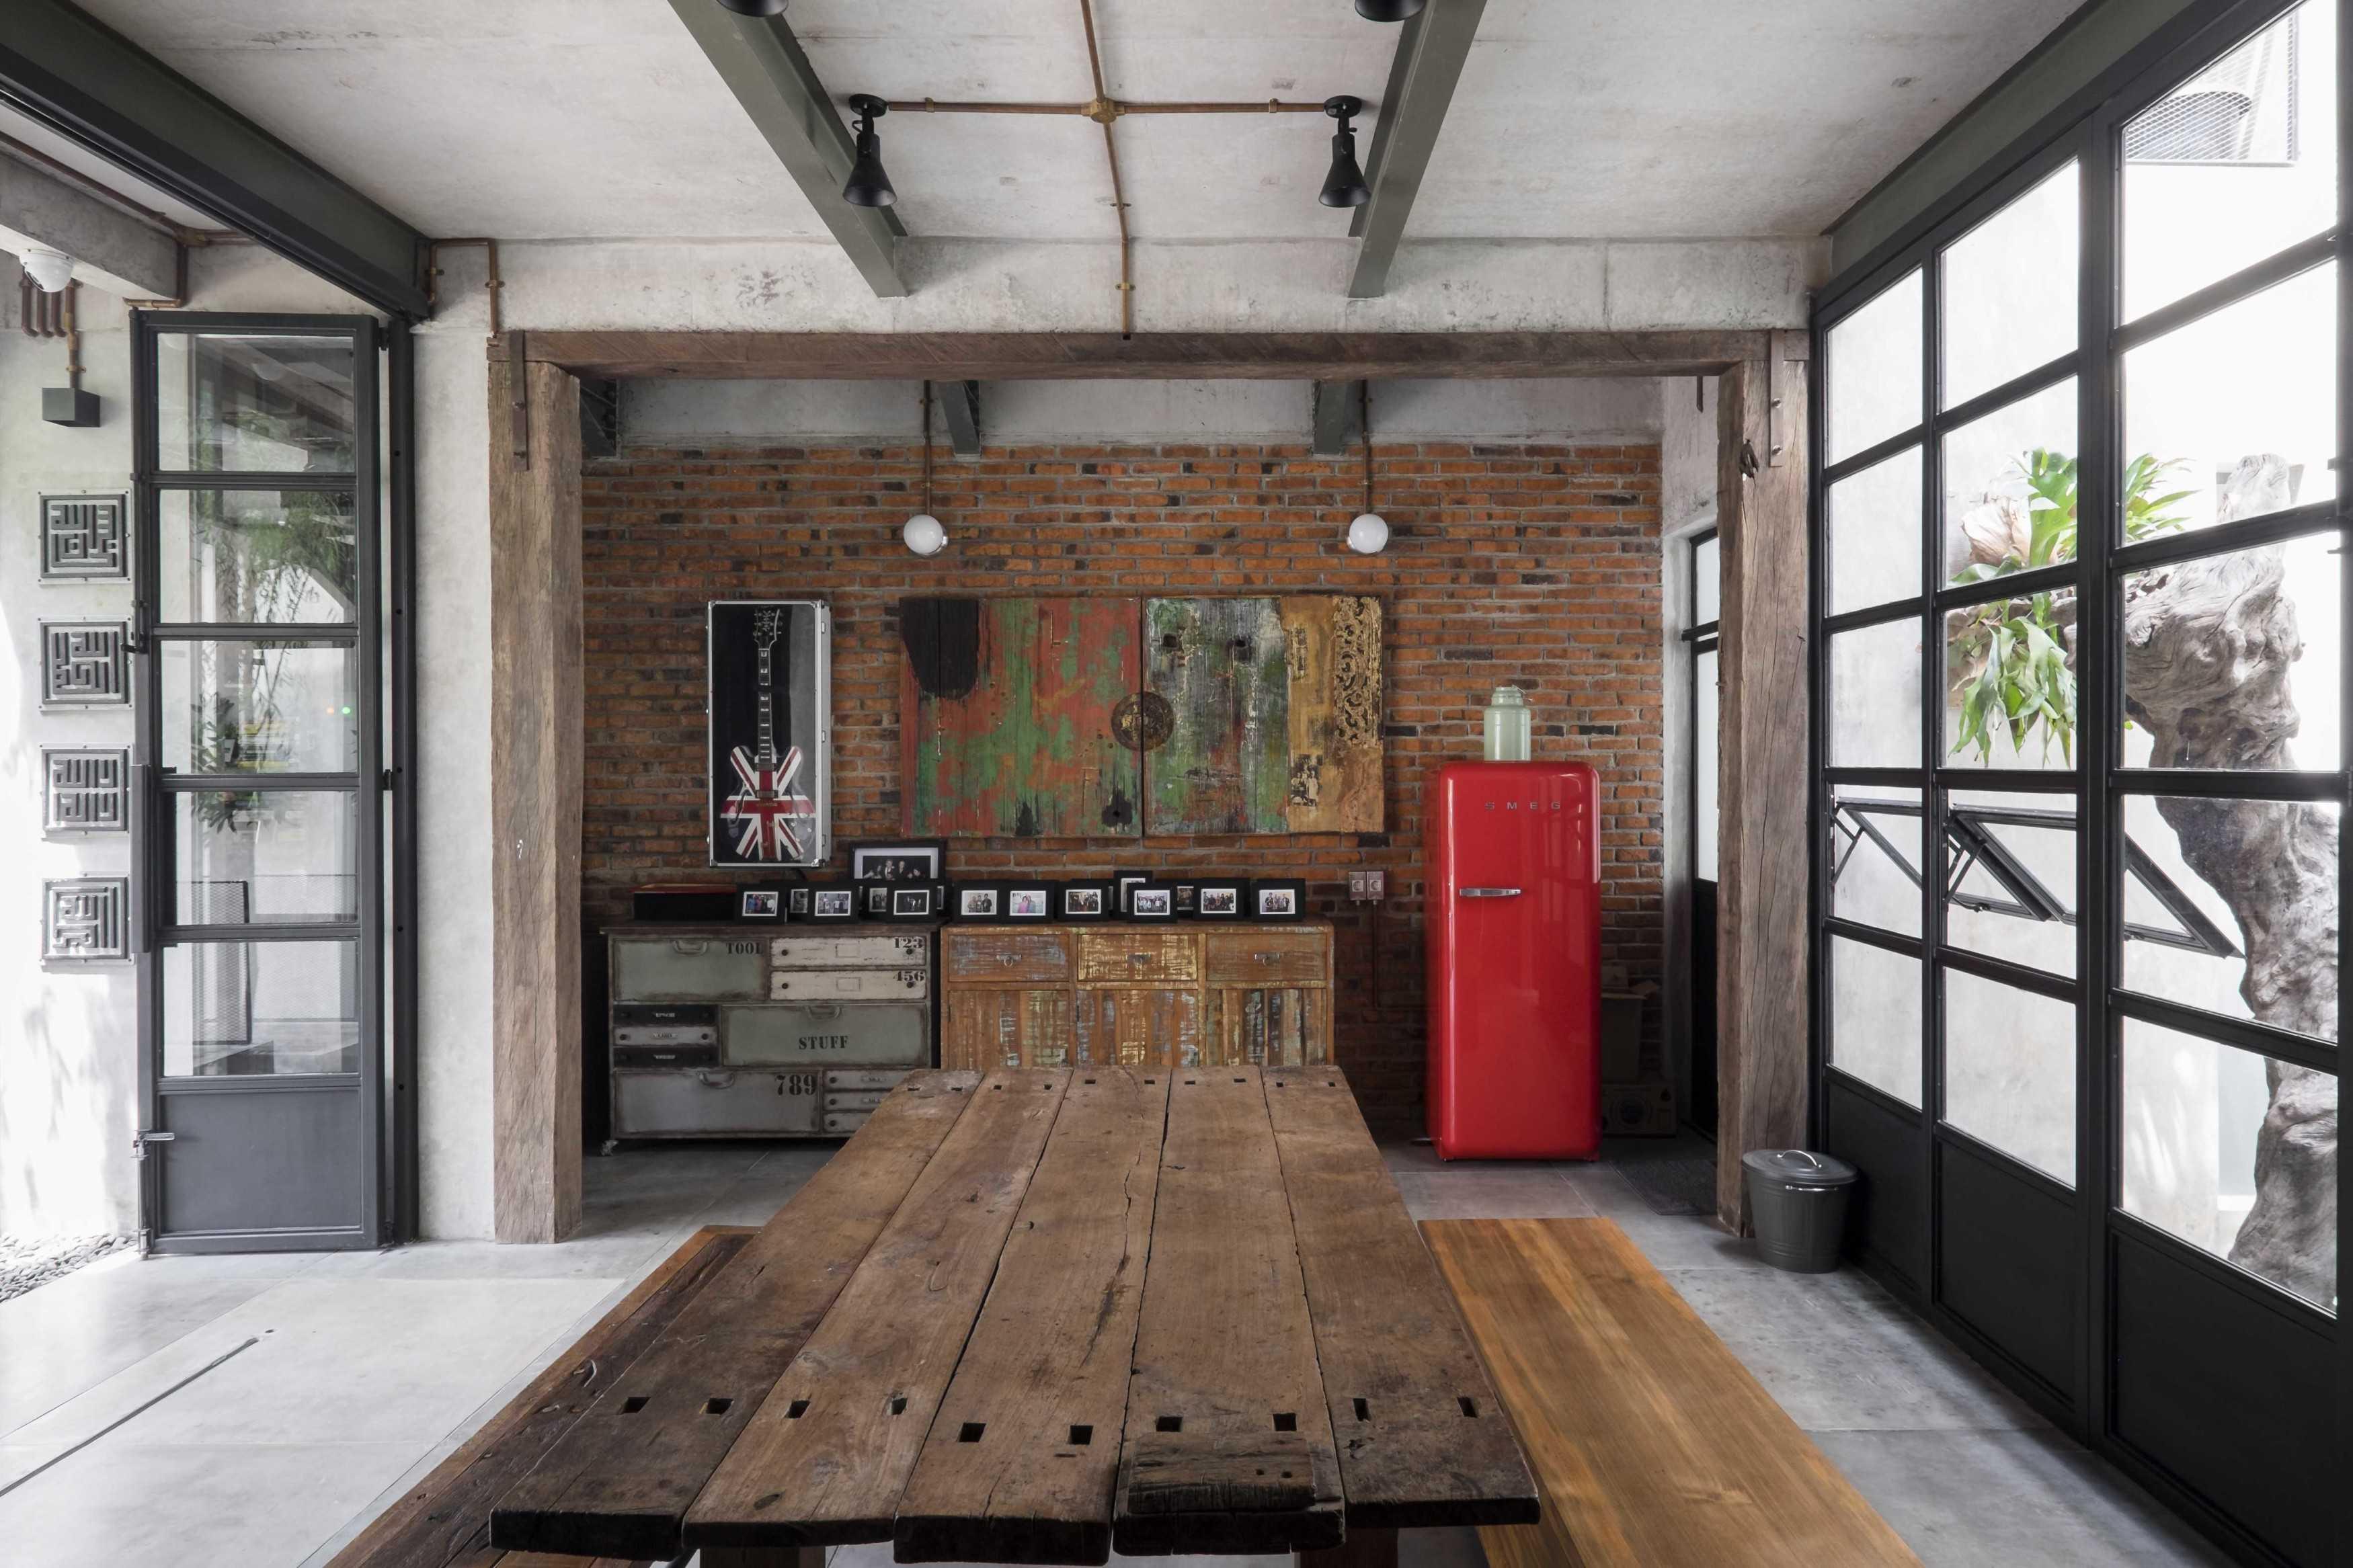 Bitte Design Studio Aa Residence Cimanggis, Indonesia Cimanggis, Indonesia Interior View Industrial  23129